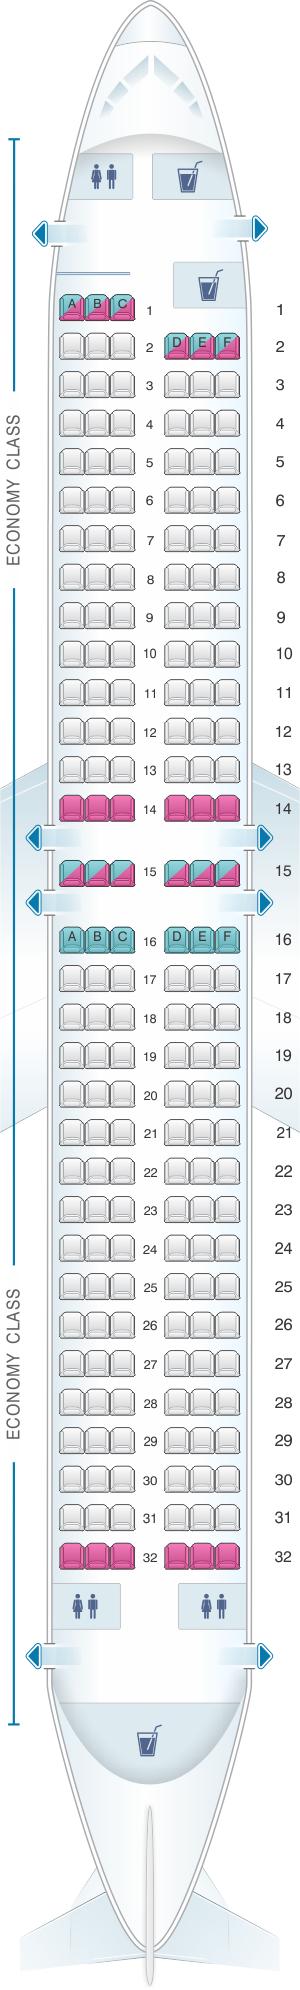 Seat Map Flydubai Boeing B737 800 Config. 1 | SeatMaestro